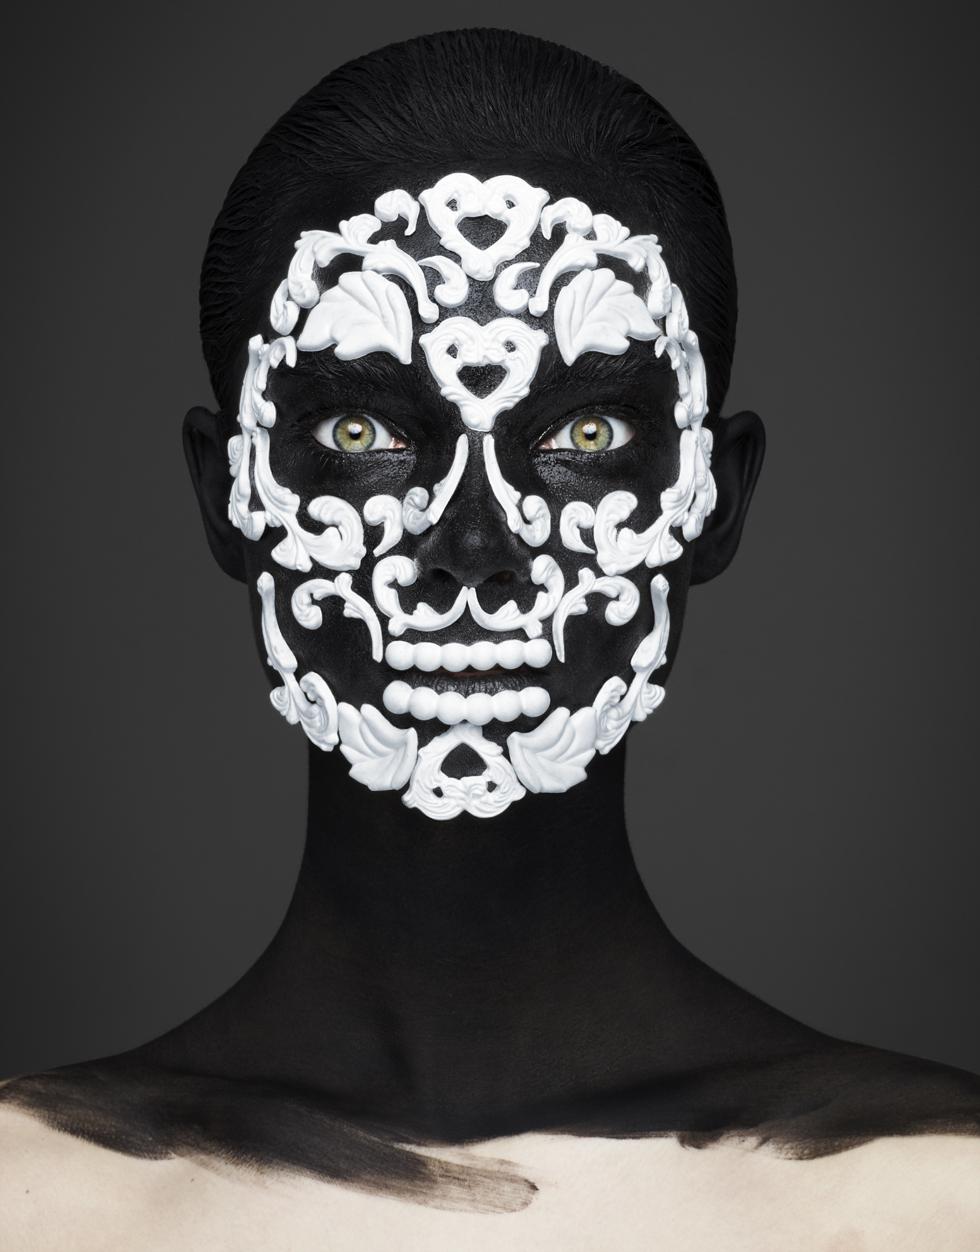 andrew-gallimore-diadelasmuertes-masks-01